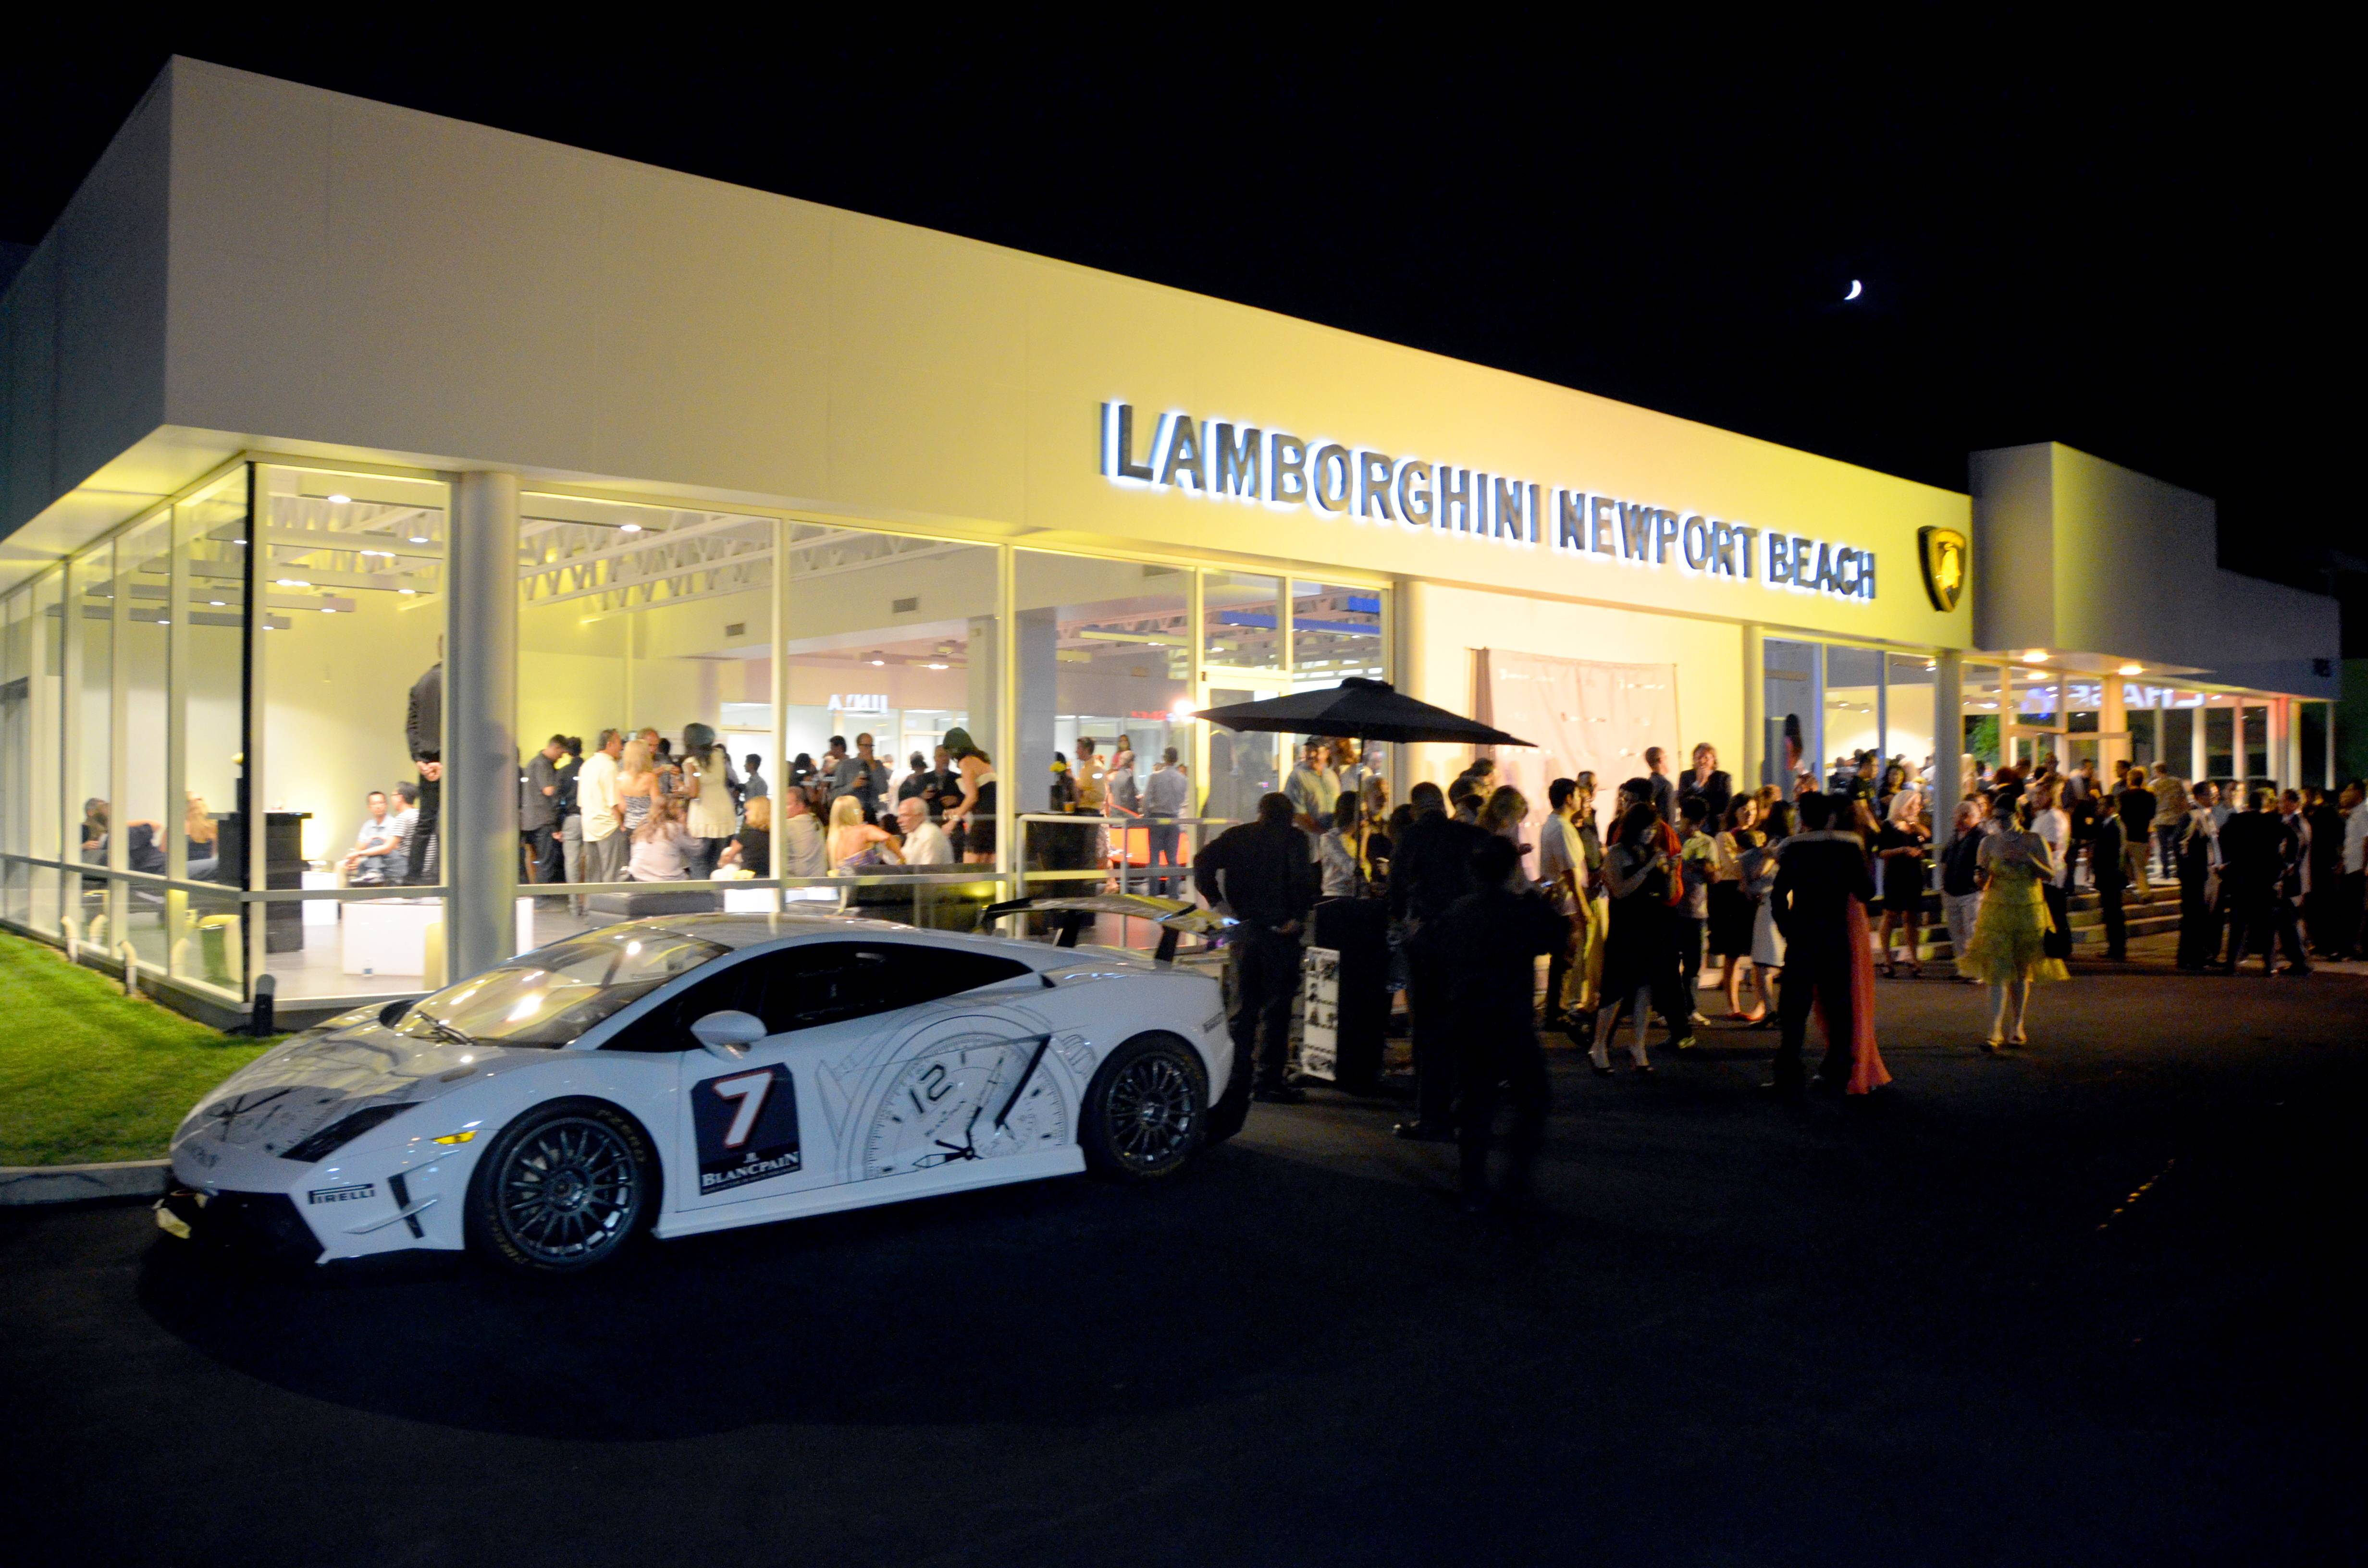 Lamborghini Newport Beach Celebrates Grand Opening With Unveiling Of